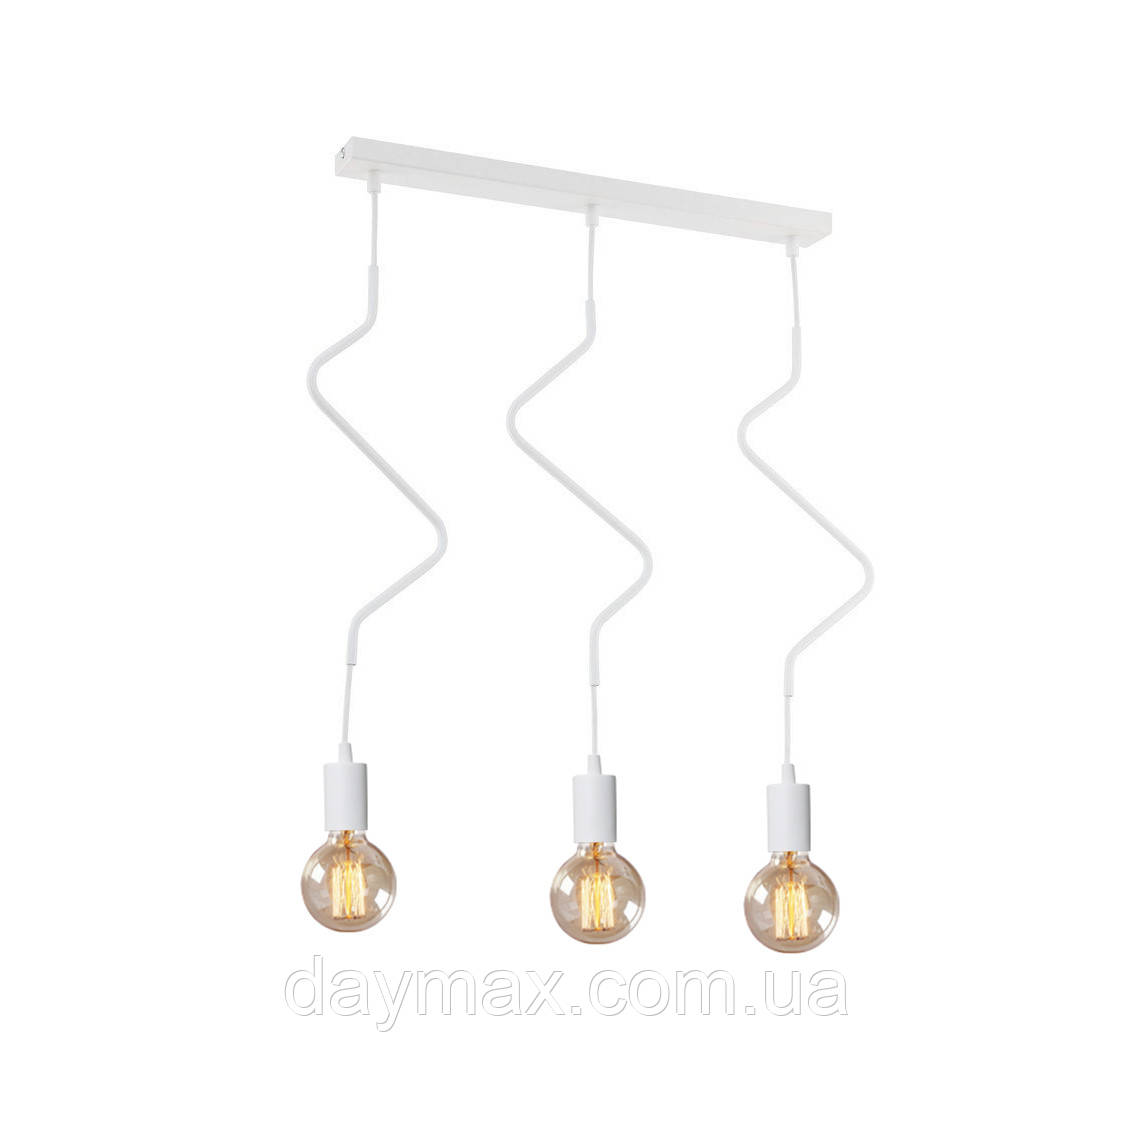 Светильник подвесной на три лампы MSK Electric NL 1442-3W  ZIGZAG